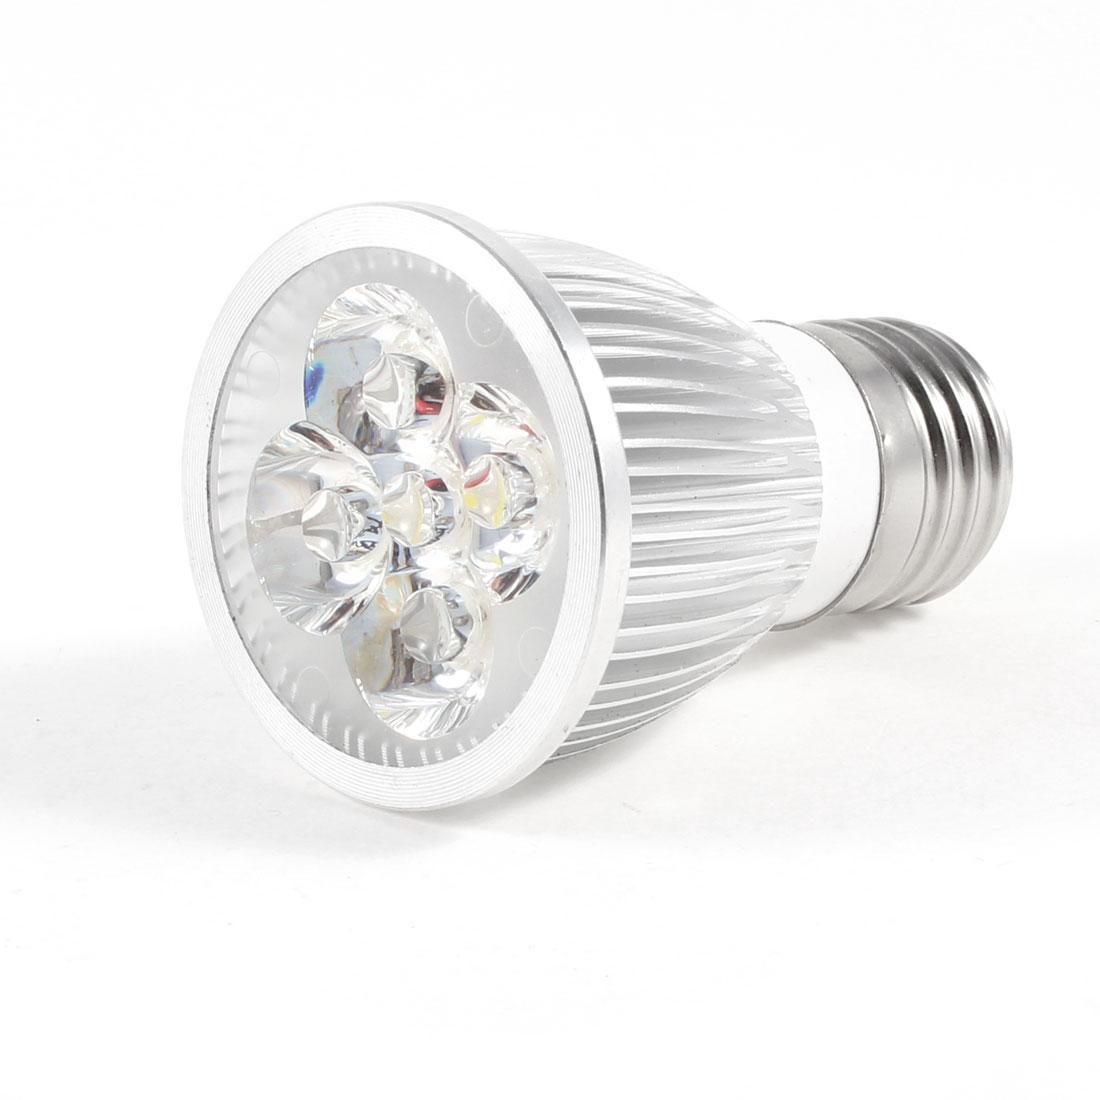 Silver Tone E27 Screw Base 5W 220V 5 LEDs White Light Spotlight Lamp